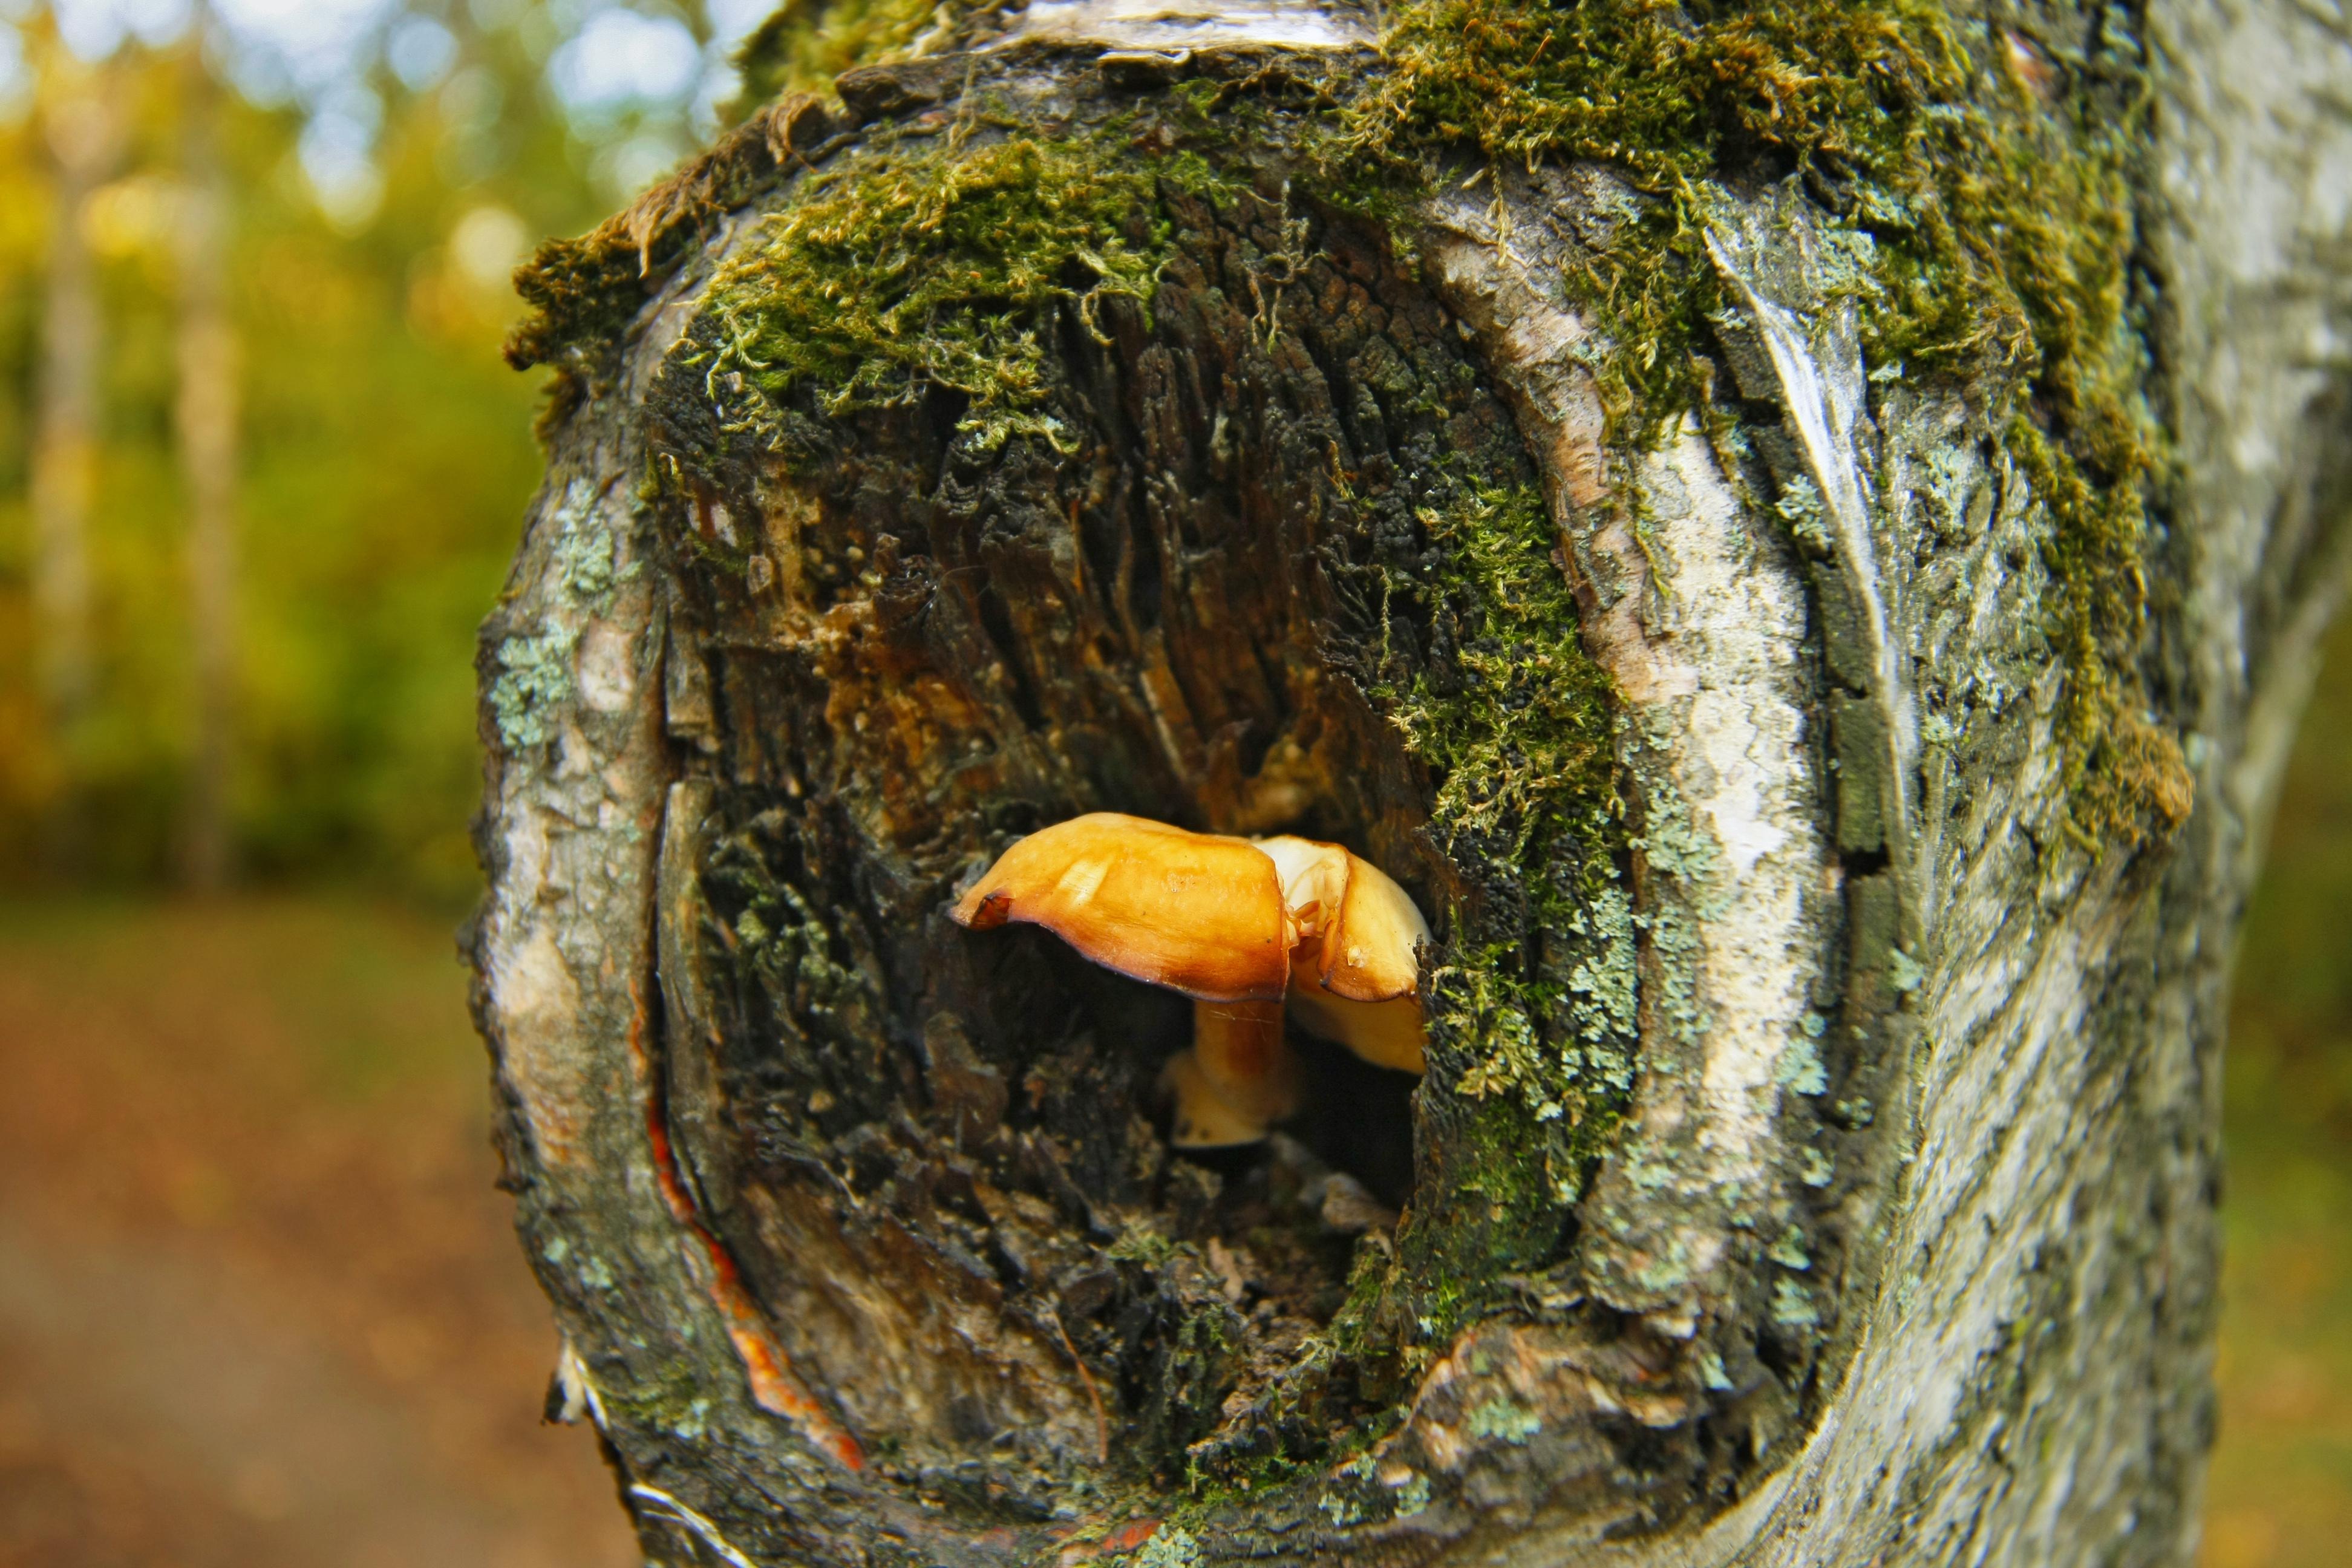 mushroom in a hollow